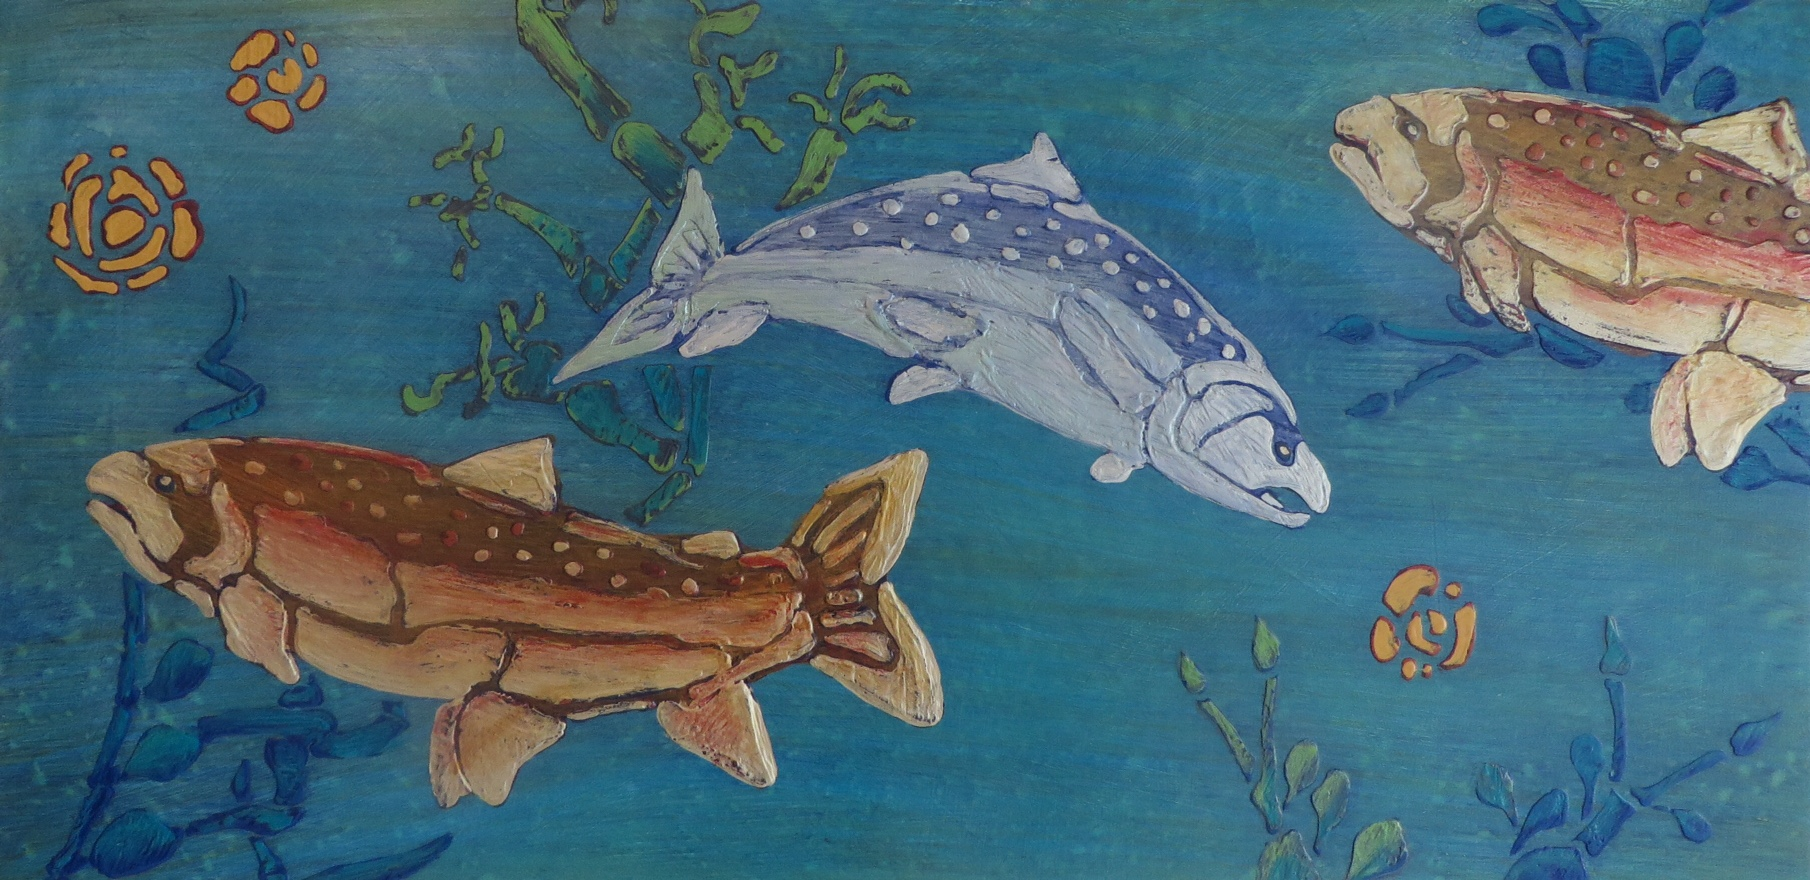 Penobscot Study (Salmon + Alewife)